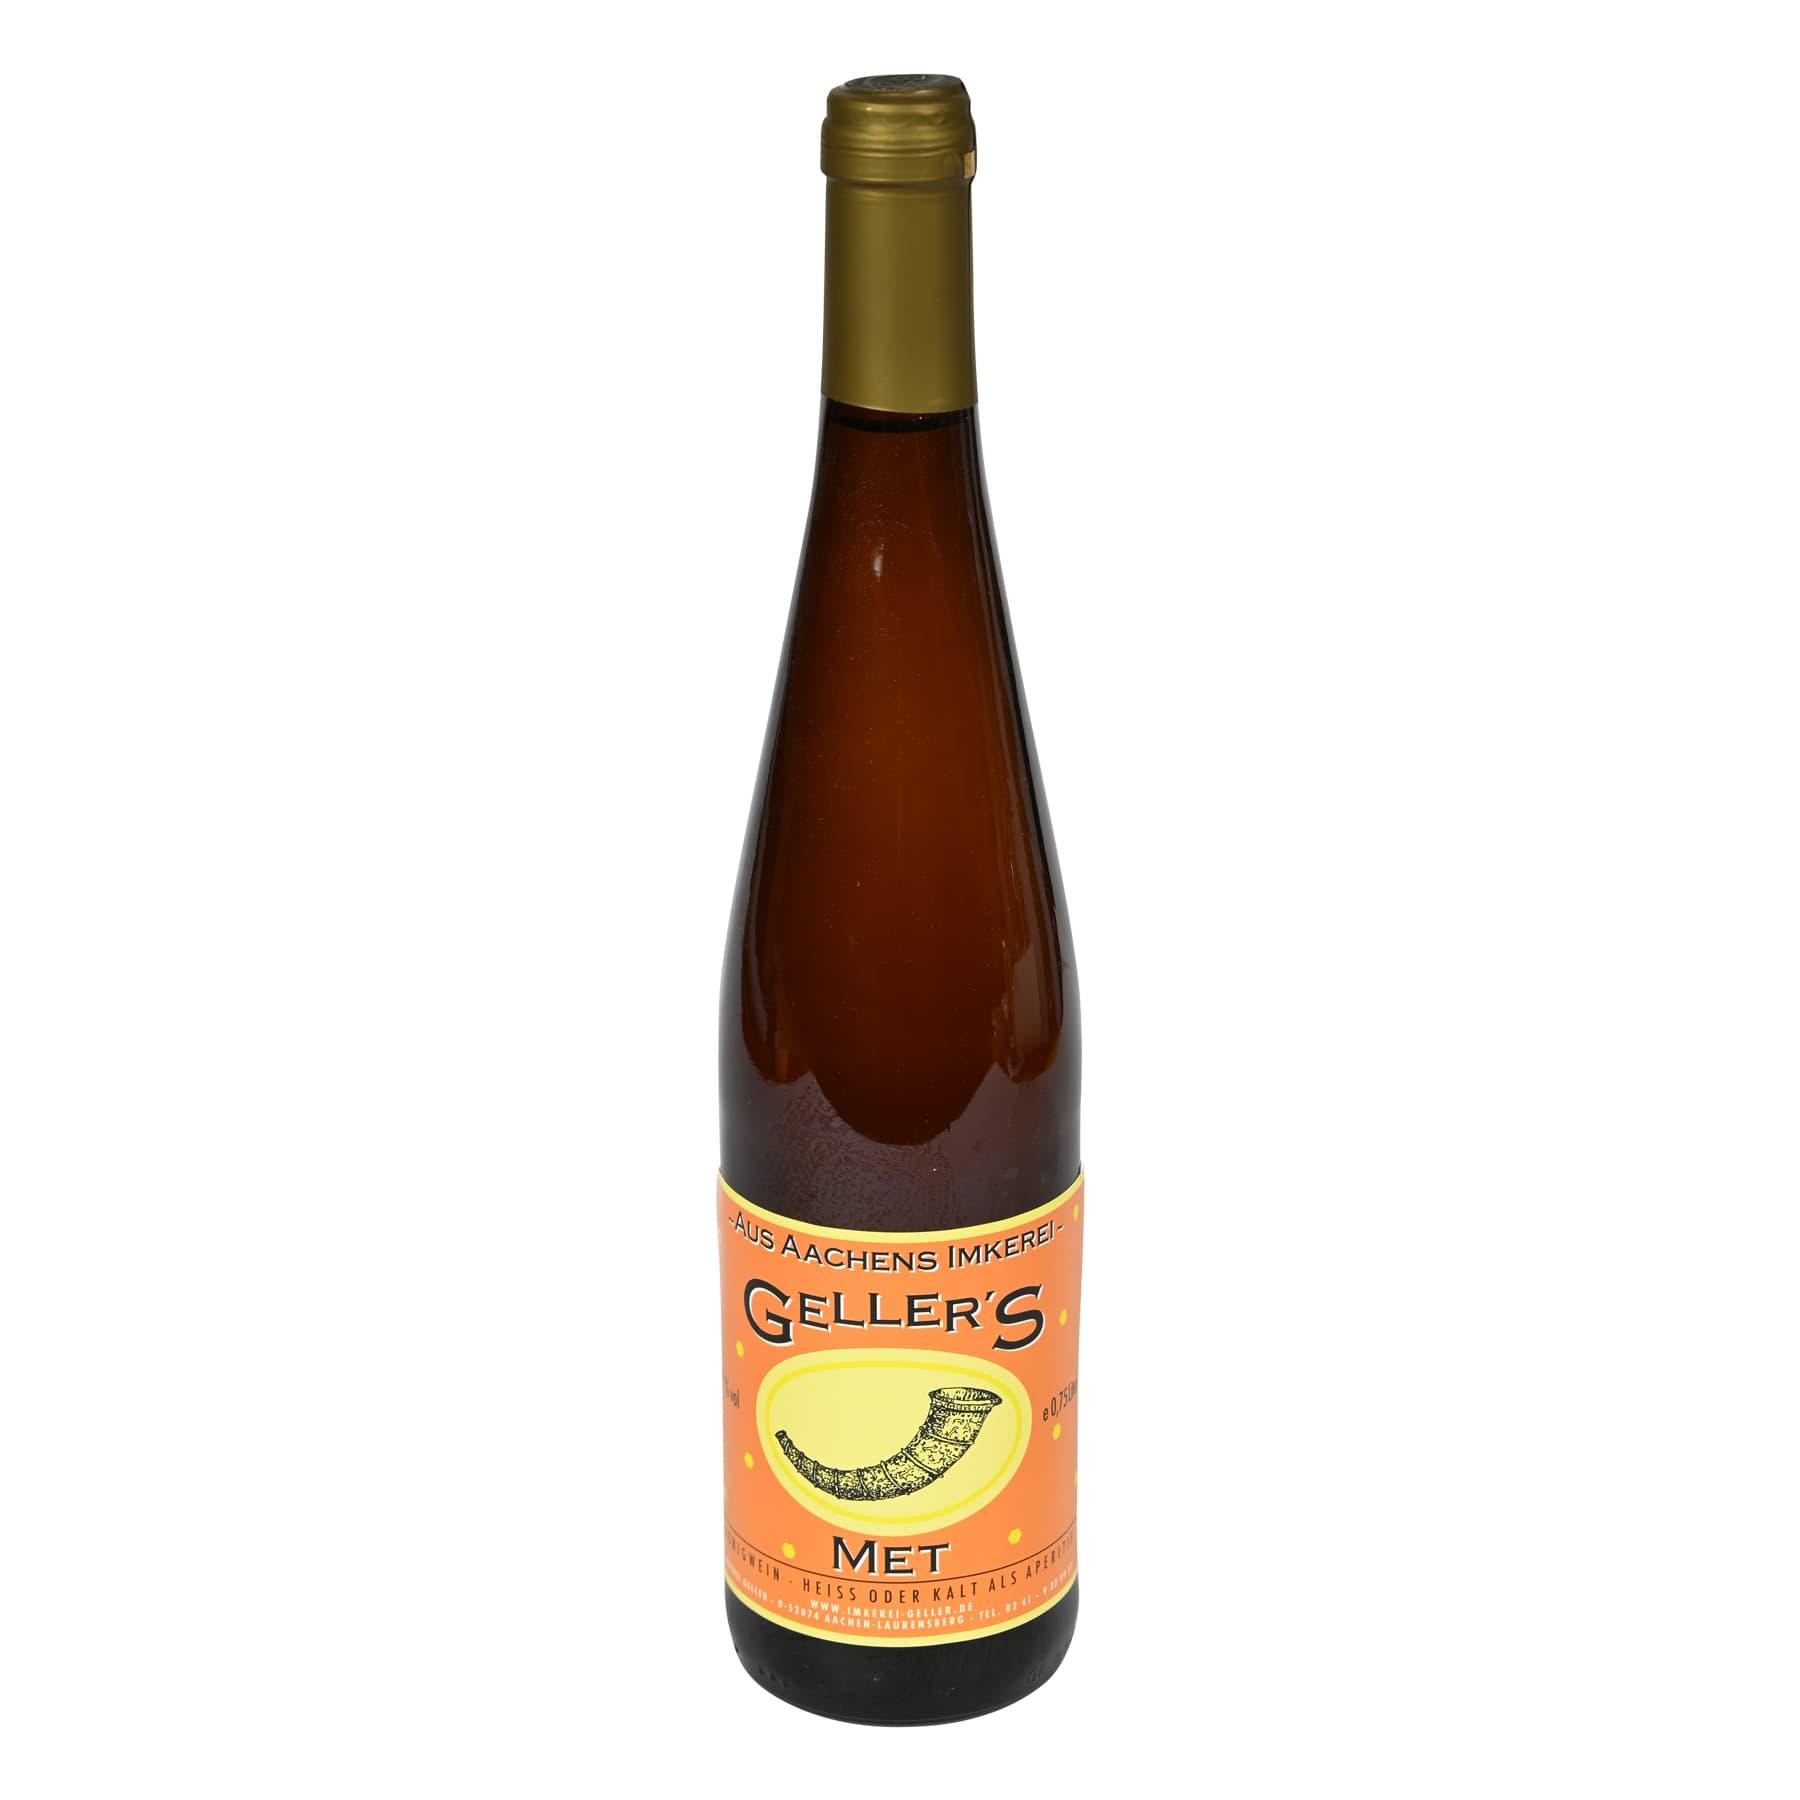 Honigwein - Met, feinherb, 0,75 l Flasche (olivgrüne Kapsel)